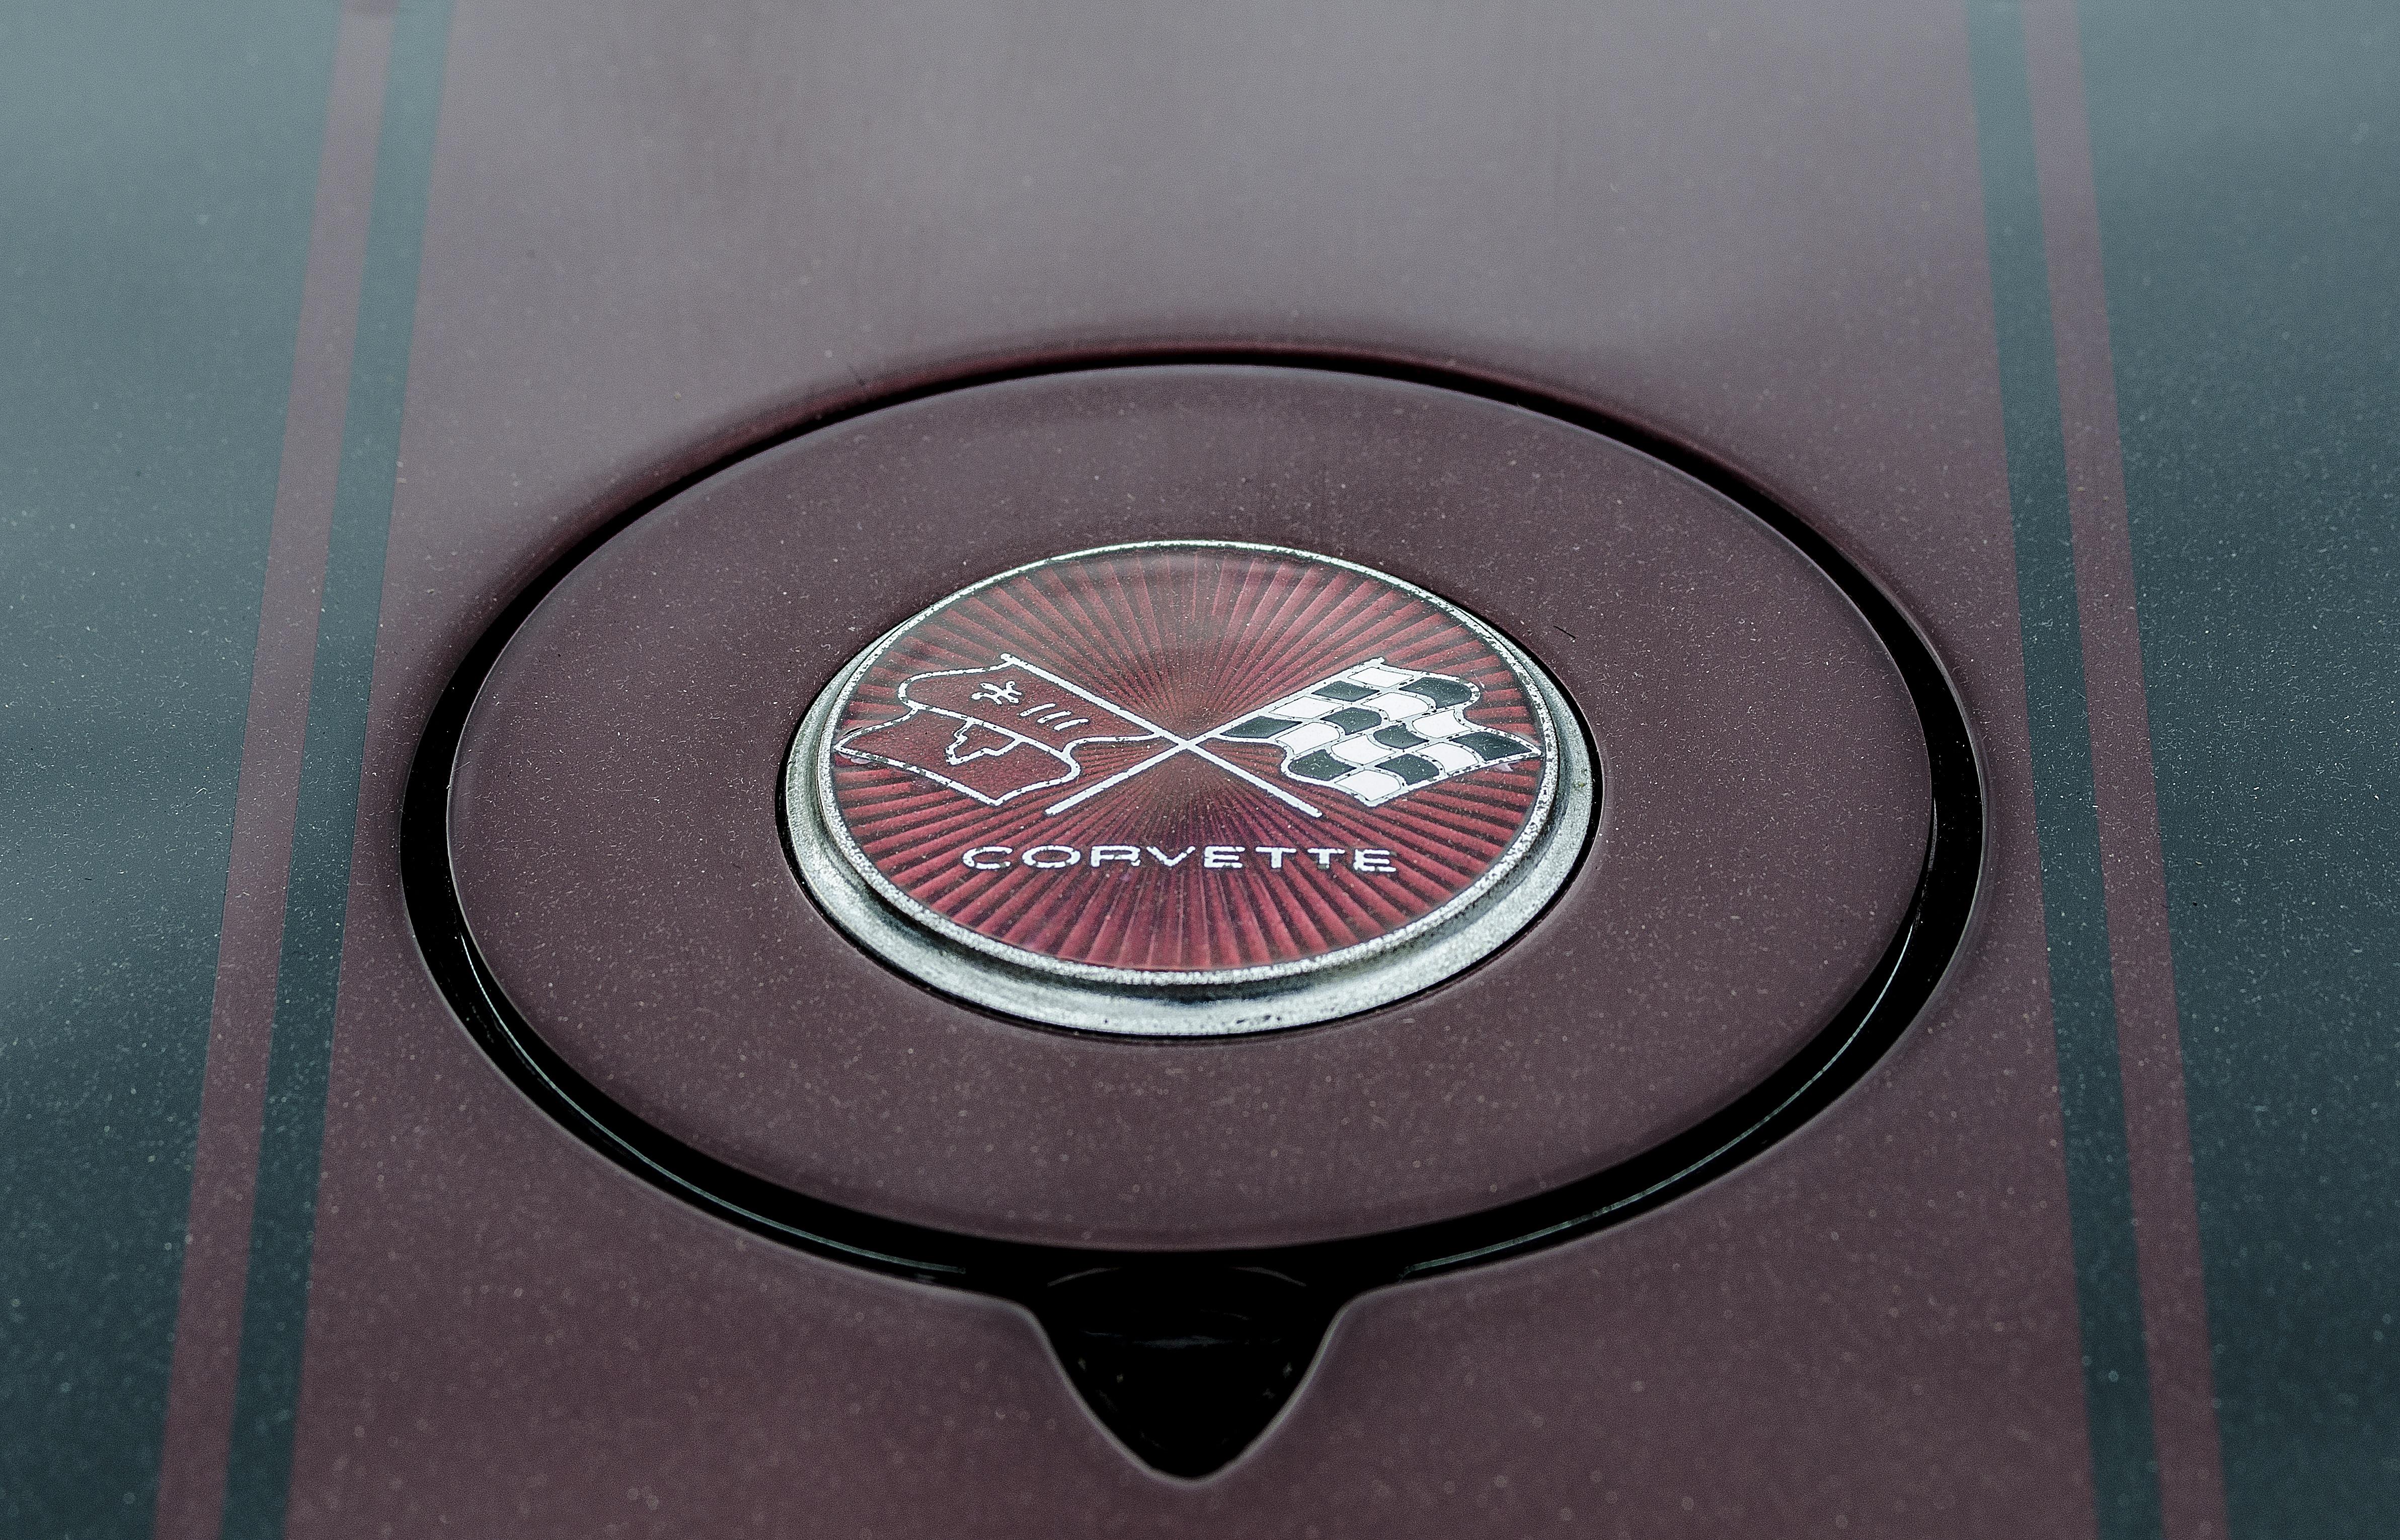 89228 скачать обои Шевроле (Chevrolet), Тачки (Cars), Corvette, Логотип - заставки и картинки бесплатно